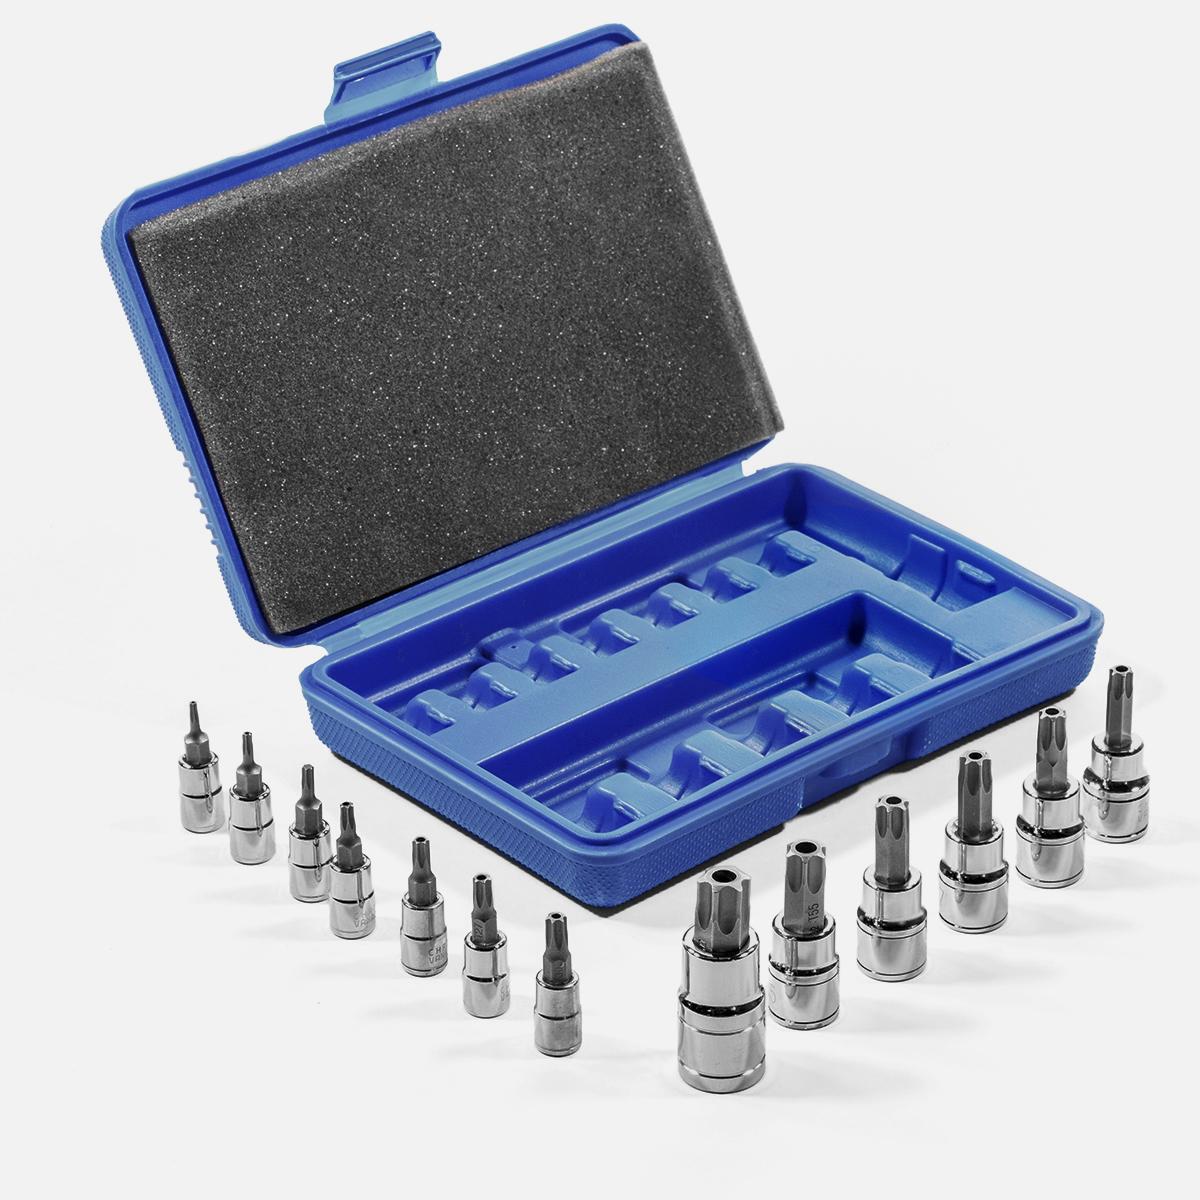 13 Pc 6-POINT Torx Star Security S2 Steel Bit Socket Set w// Case